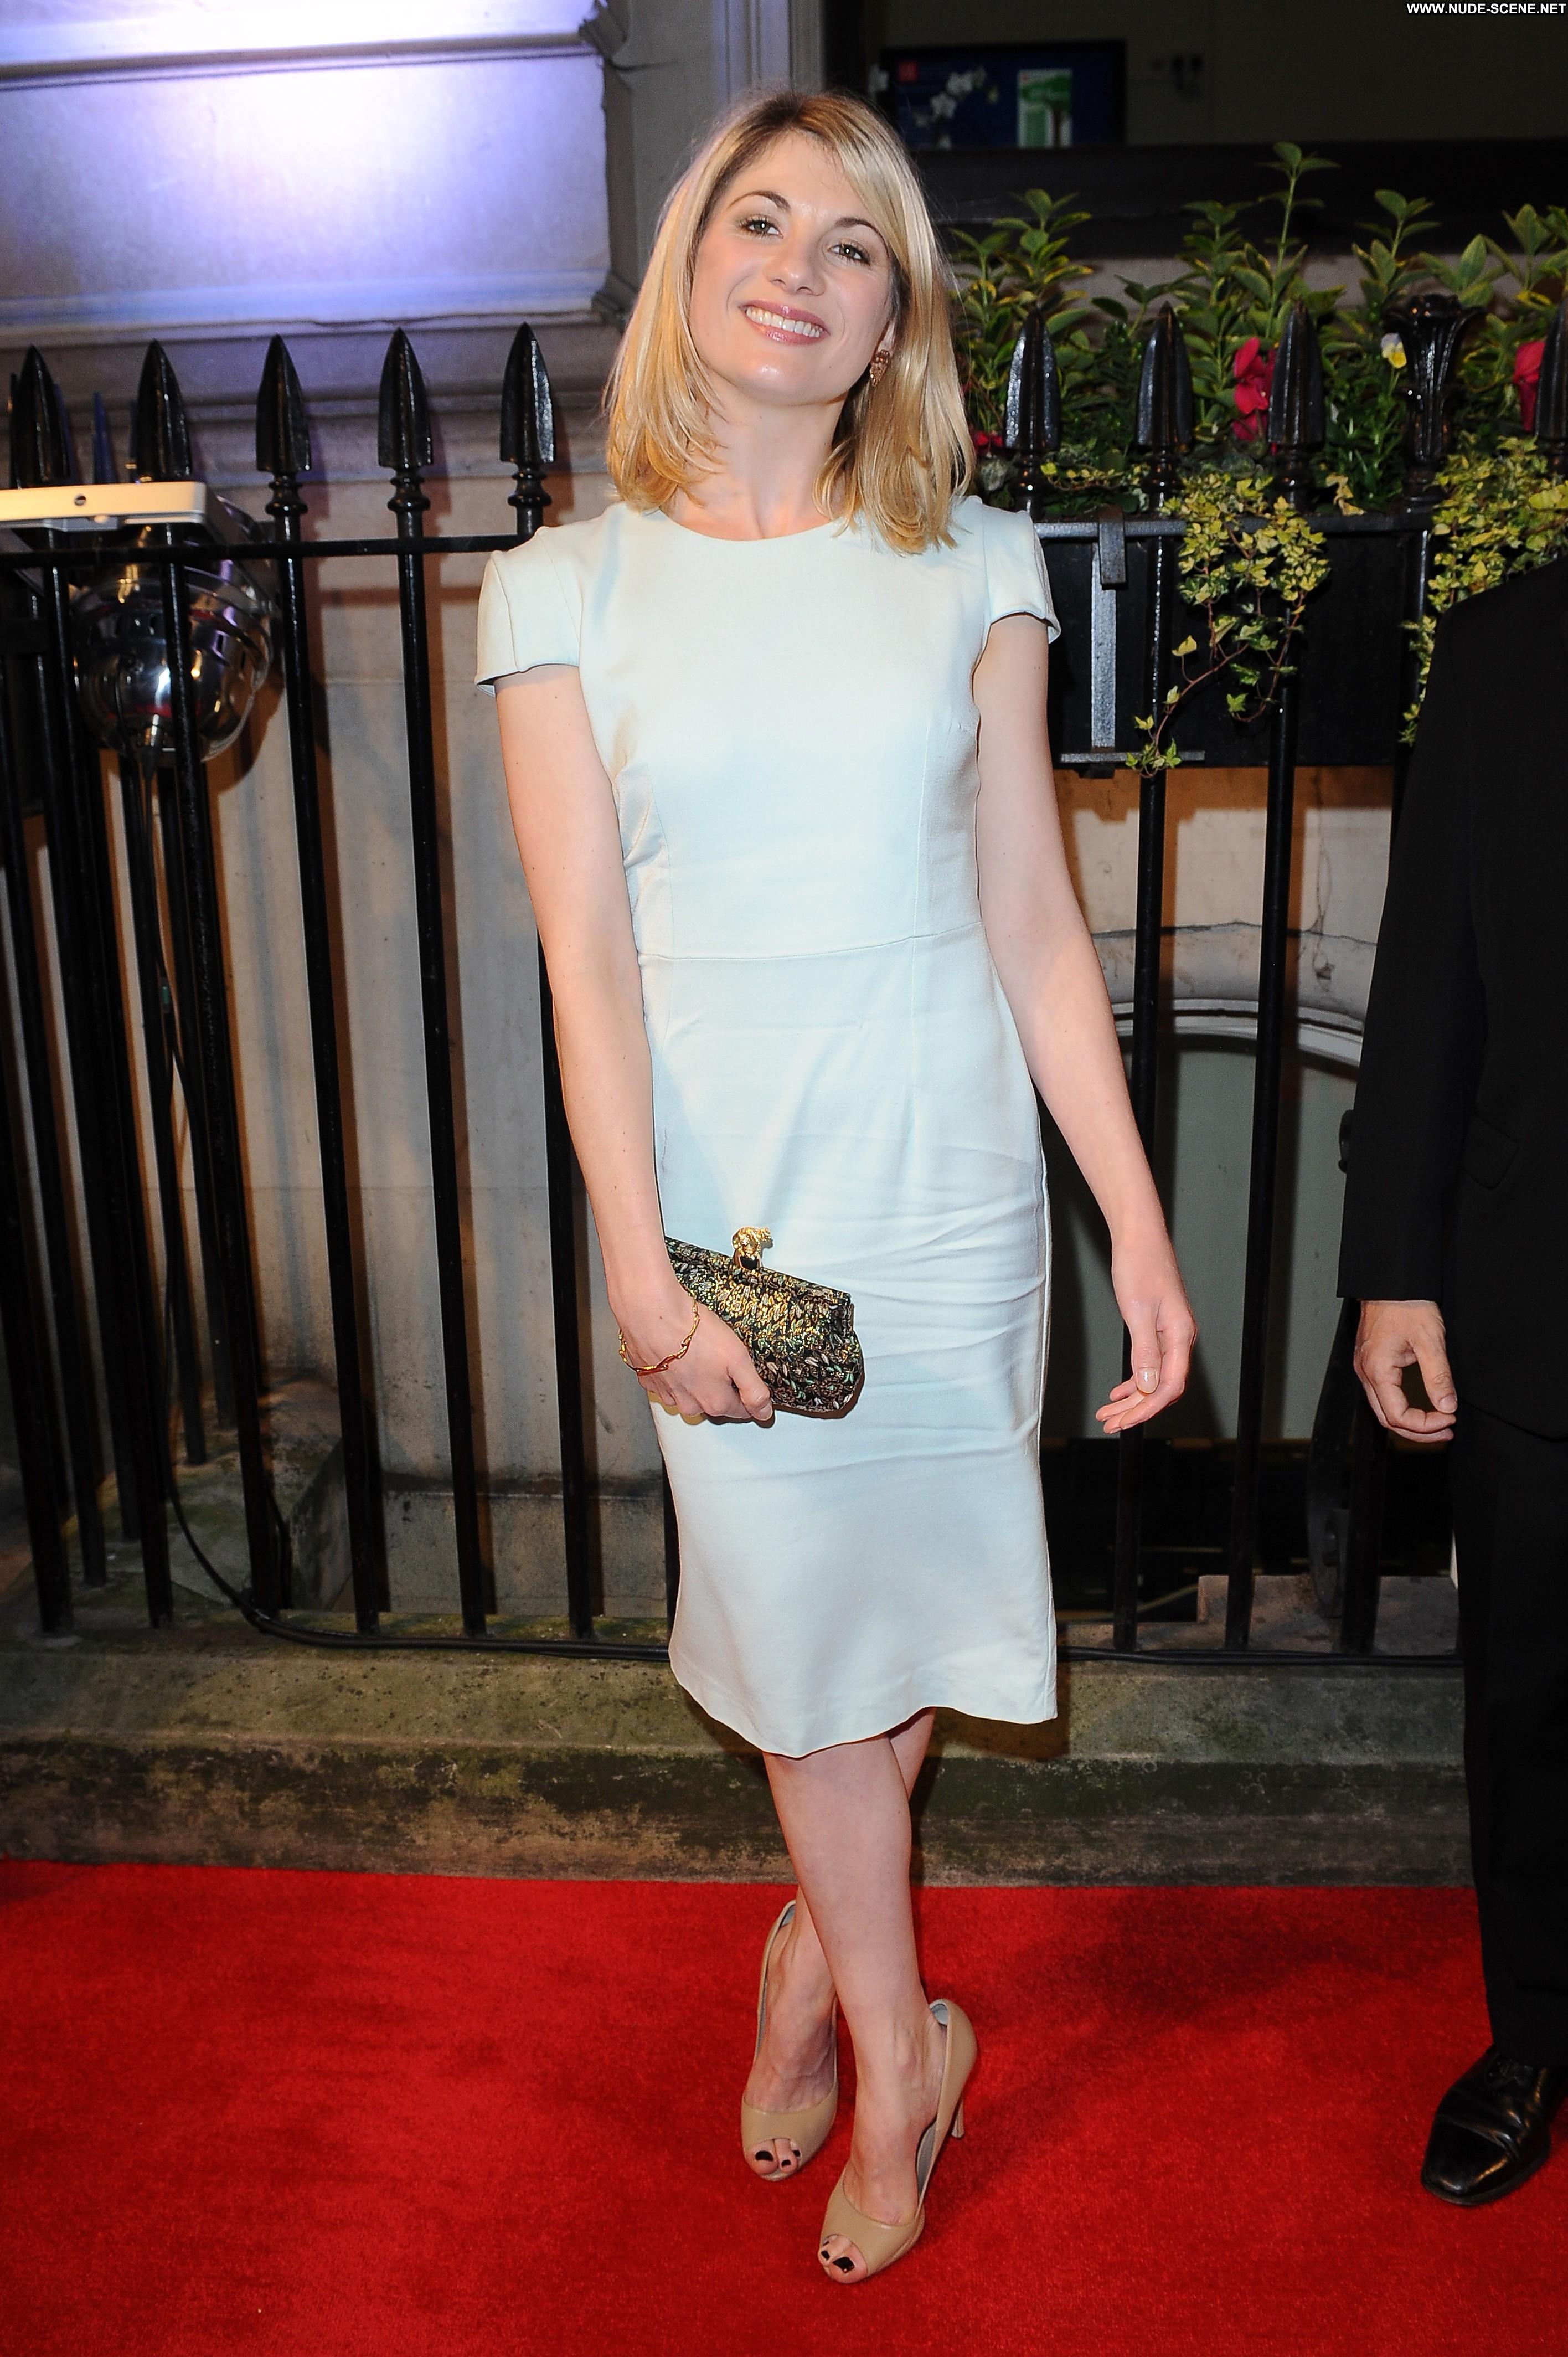 Jodie Whittaker Celebrity Beautiful Babe Posing Hot London ...